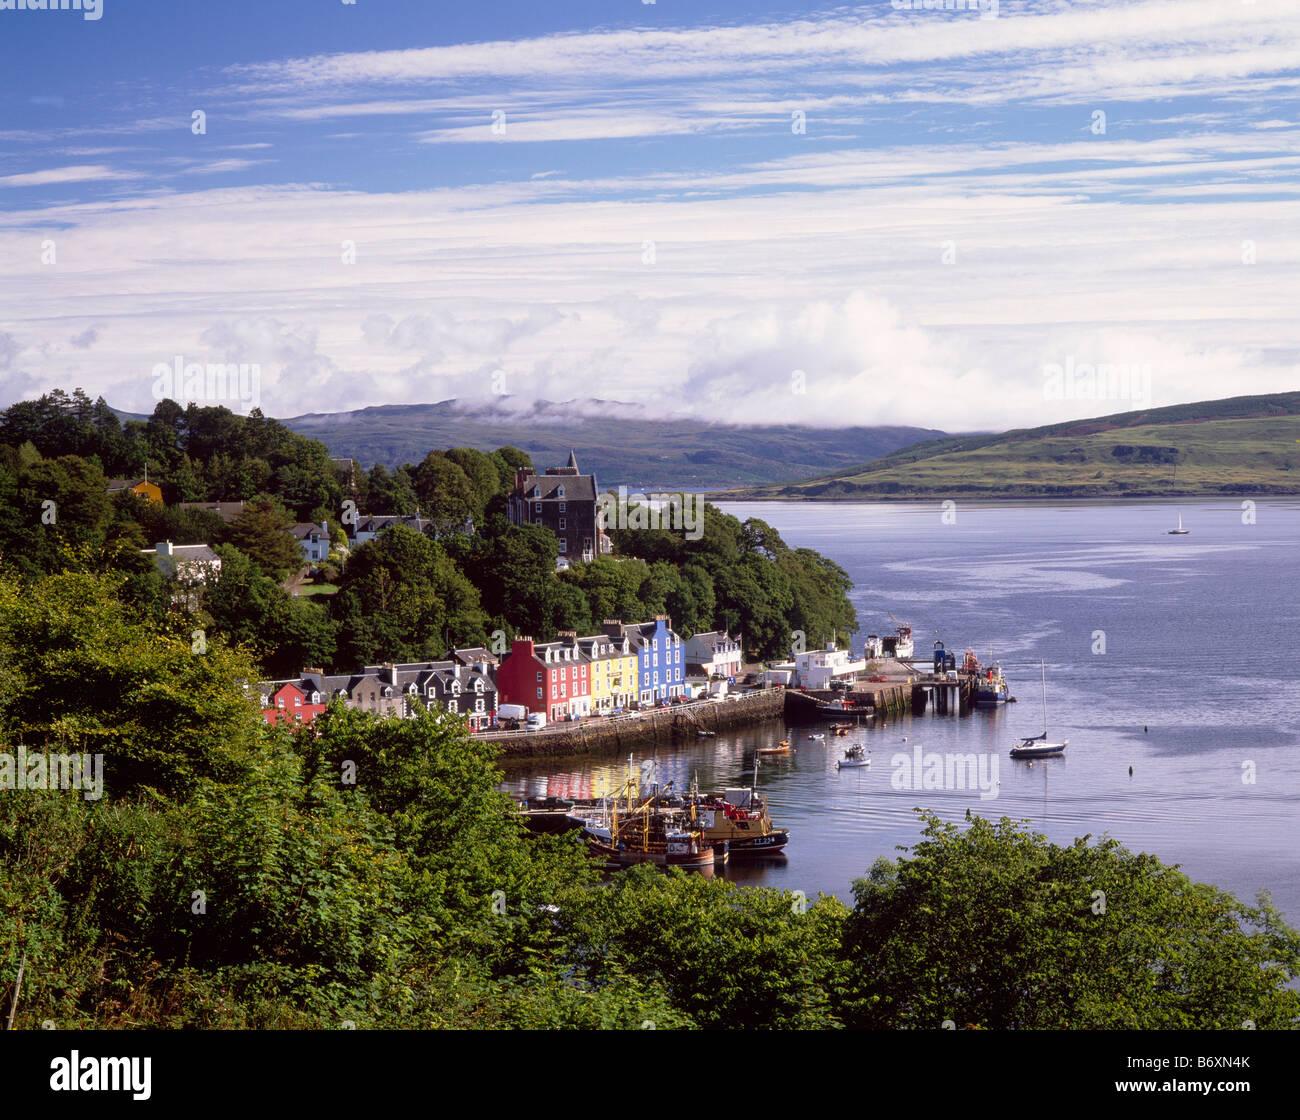 Tobermory, Isle of Mull, Argyll and Bute, Scotland, UK.  Setting of the childrens television programme Balamory. - Stock Image